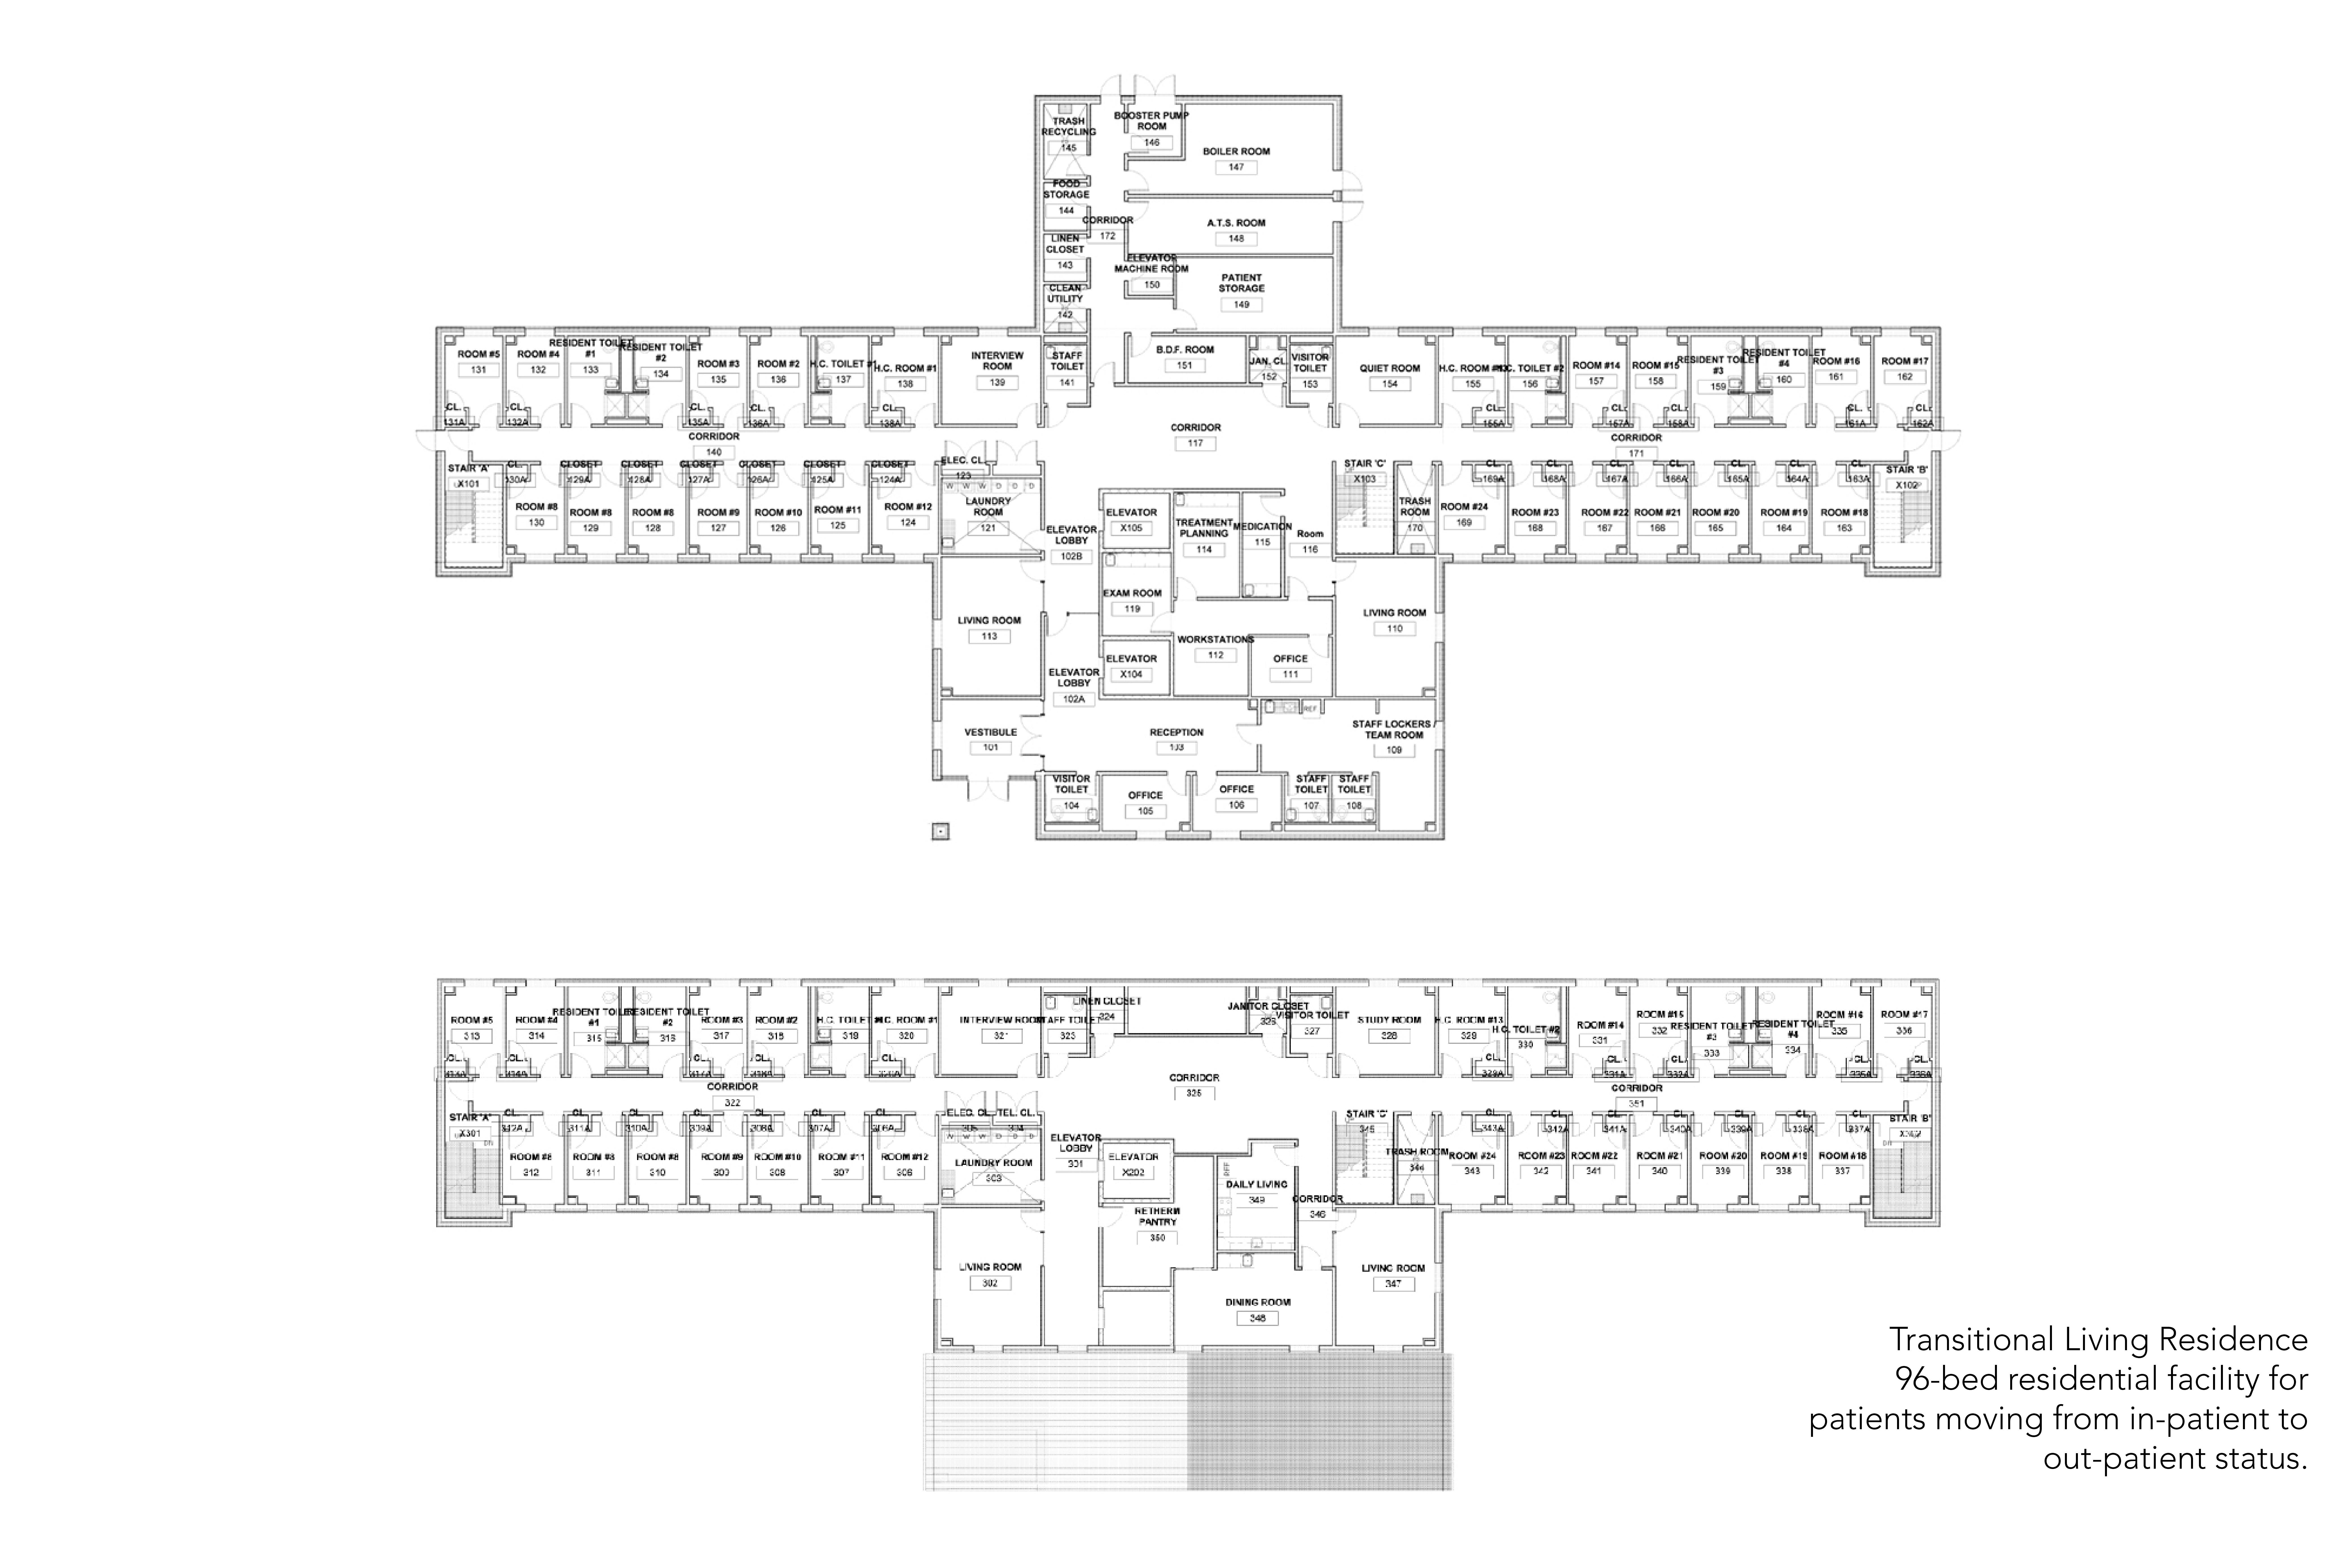 Bronx Behavioral Health Center